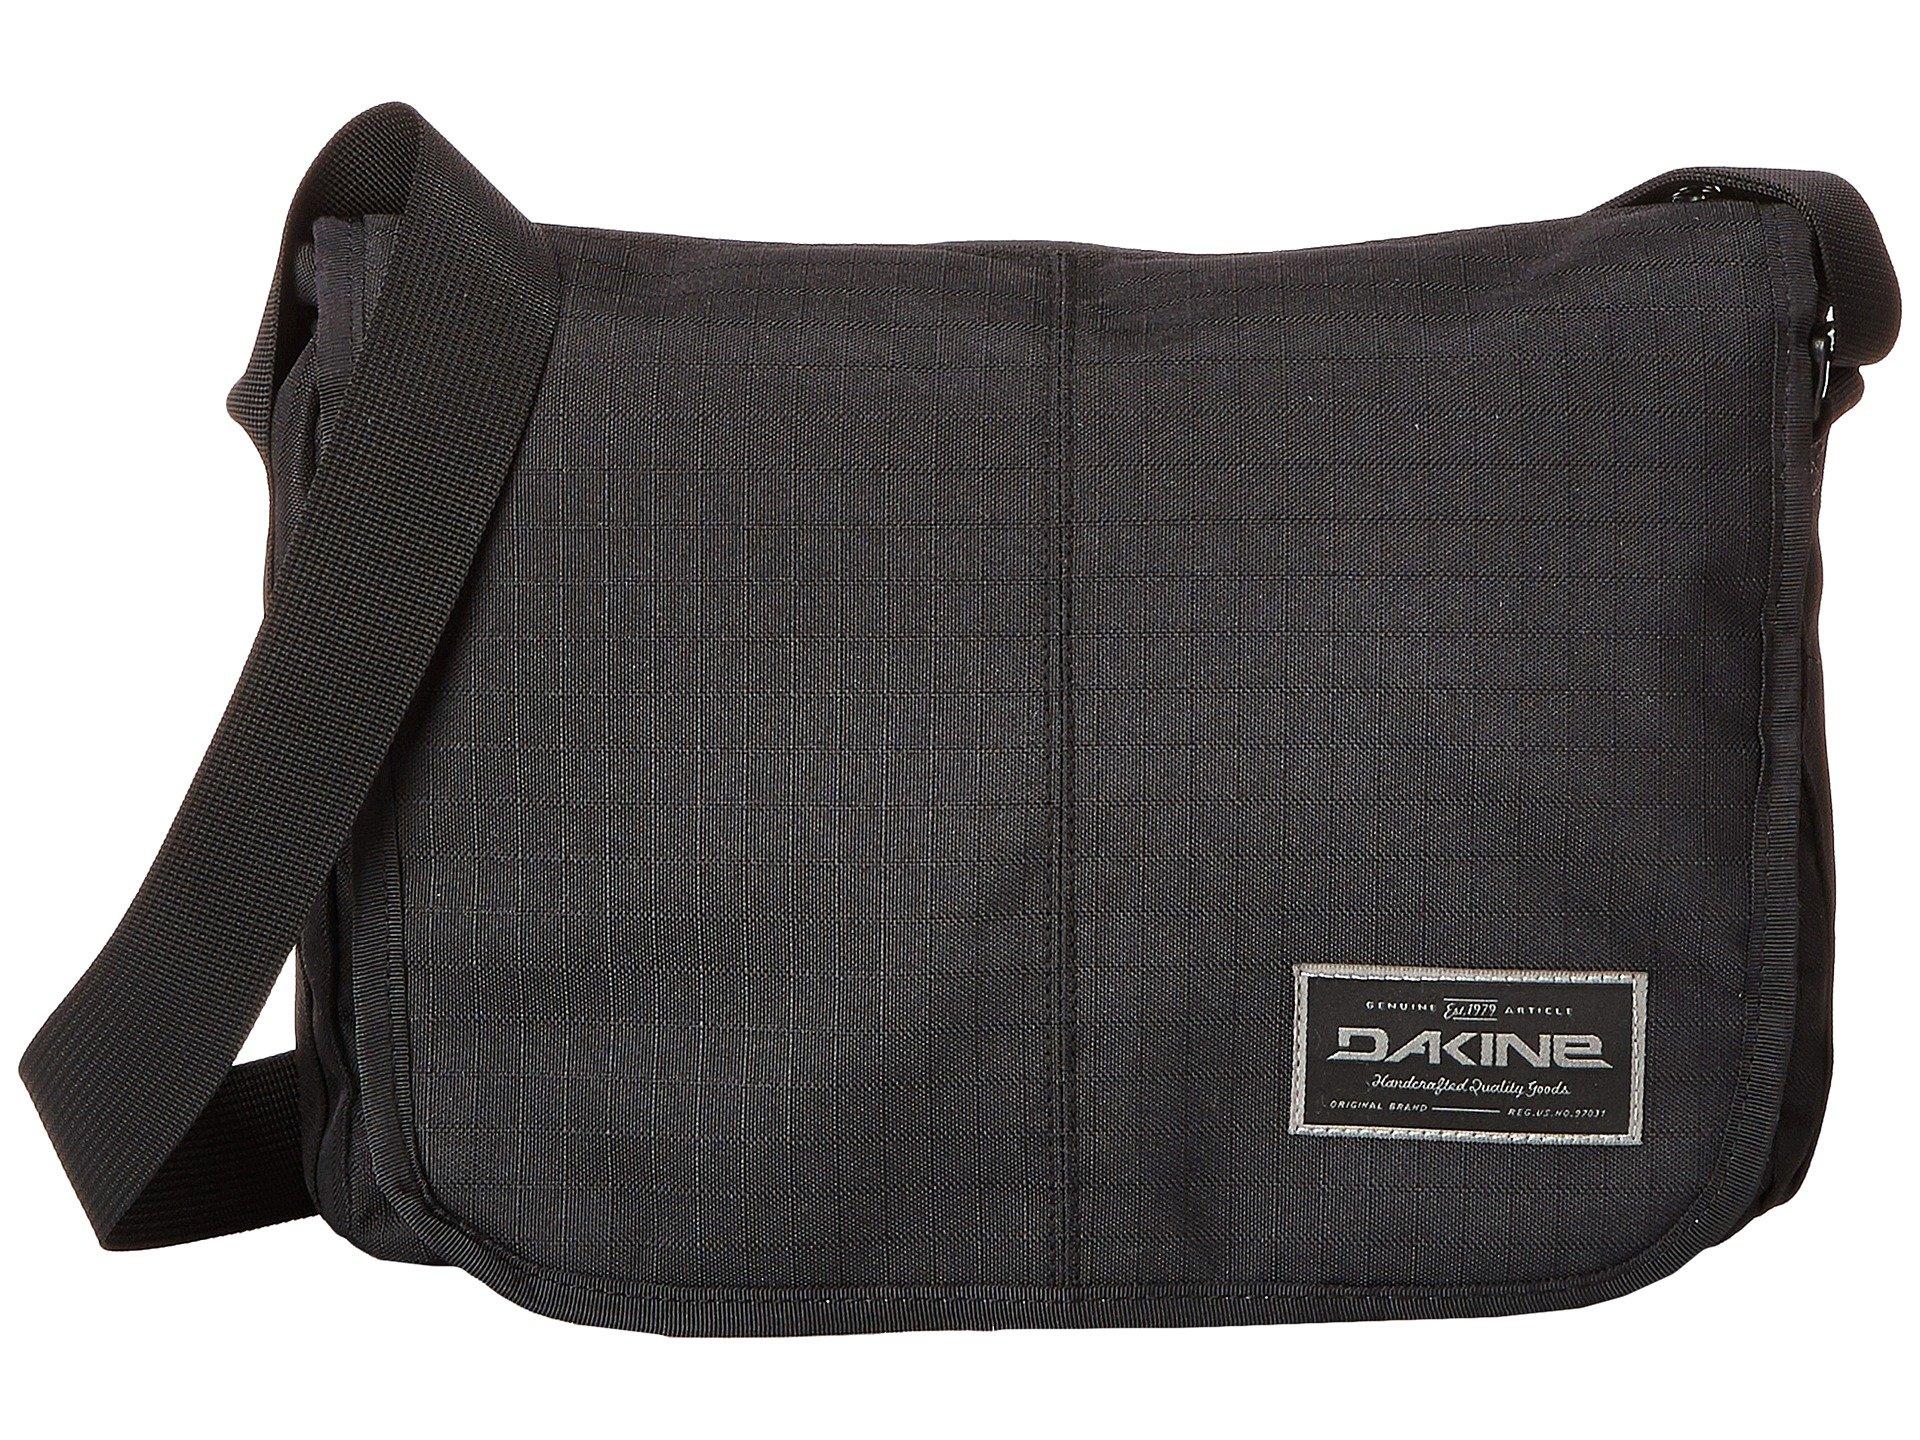 Bolso Cruzado para Hombre Dakine Outlet Messenger Bag 8L  + Dakine en VeoyCompro.net